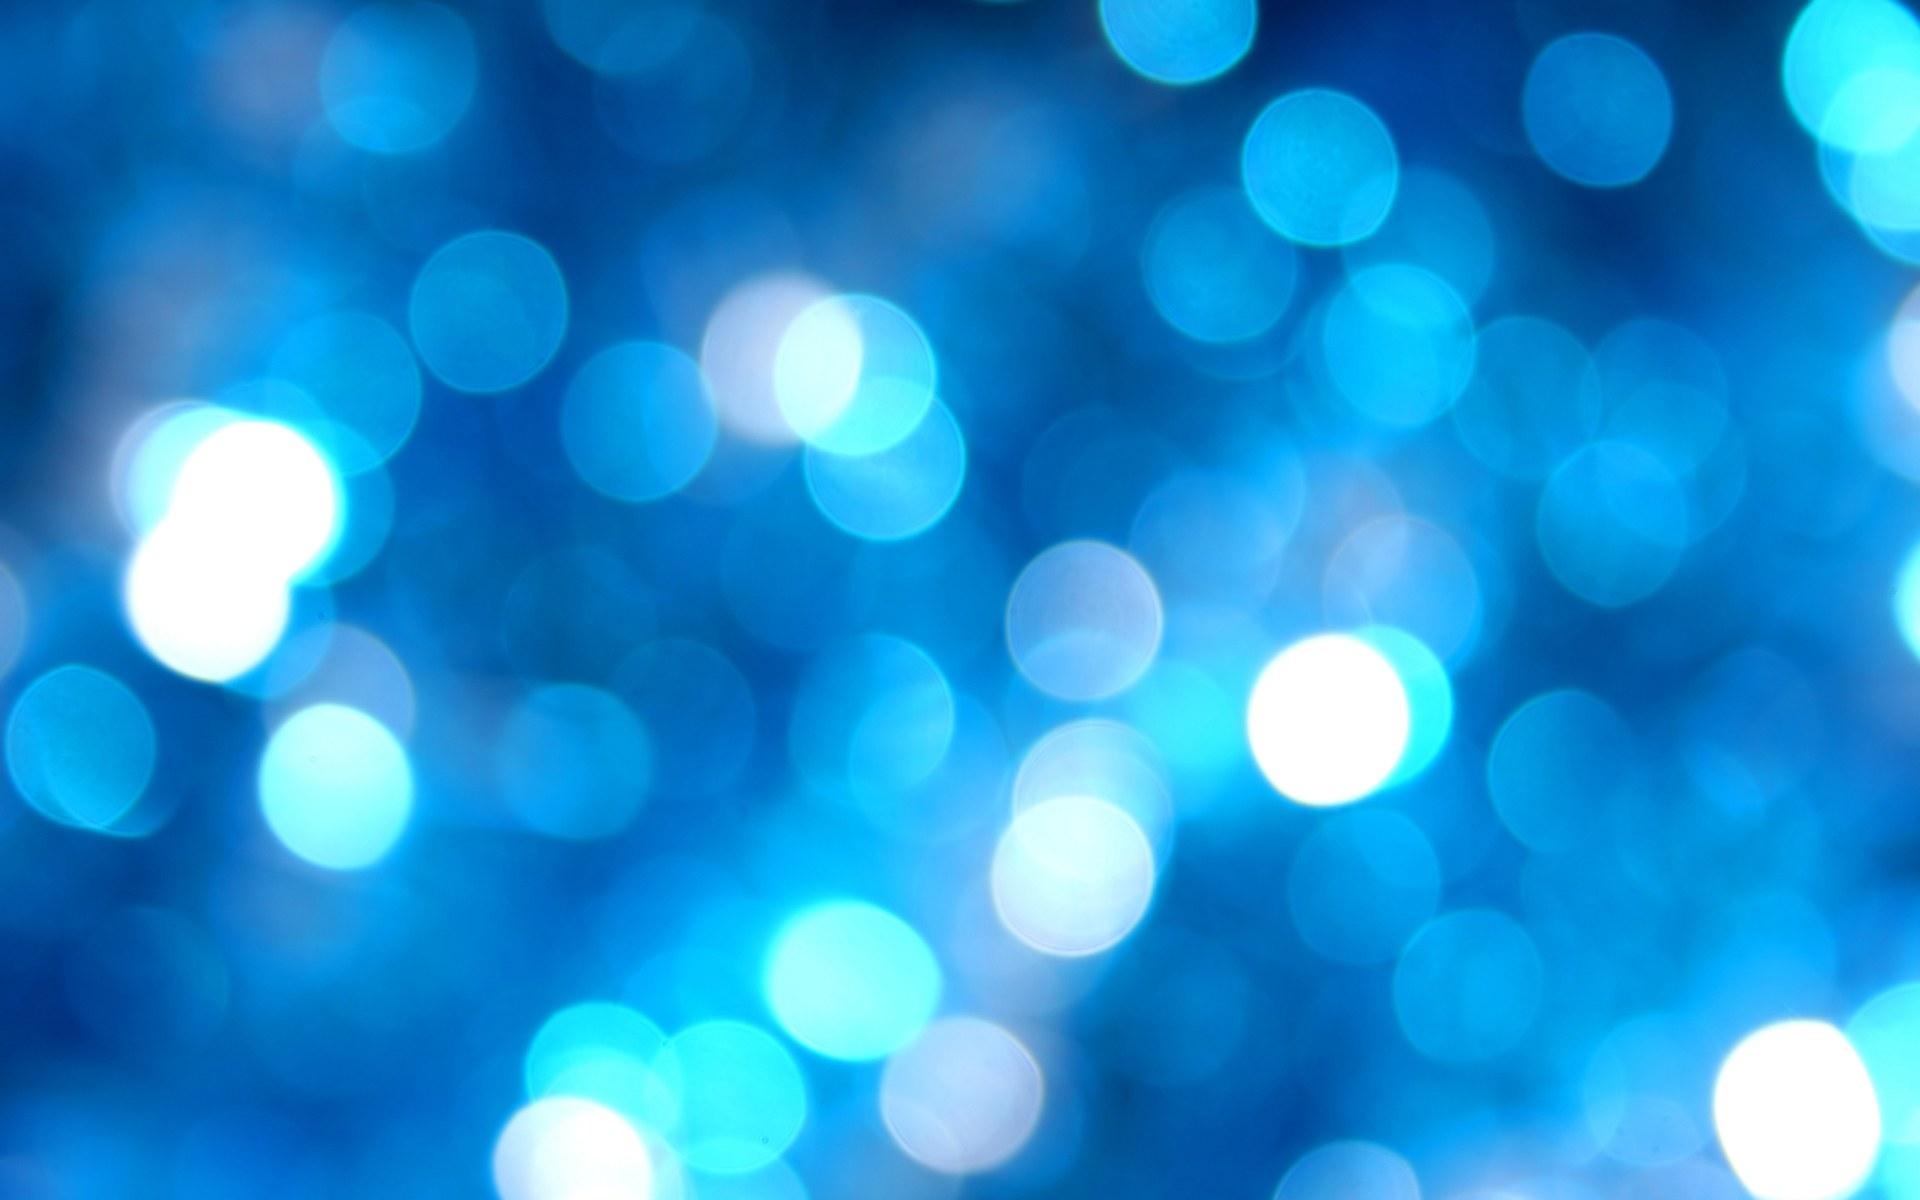 Blue Backgrounds wallpaper   604477 1920x1200